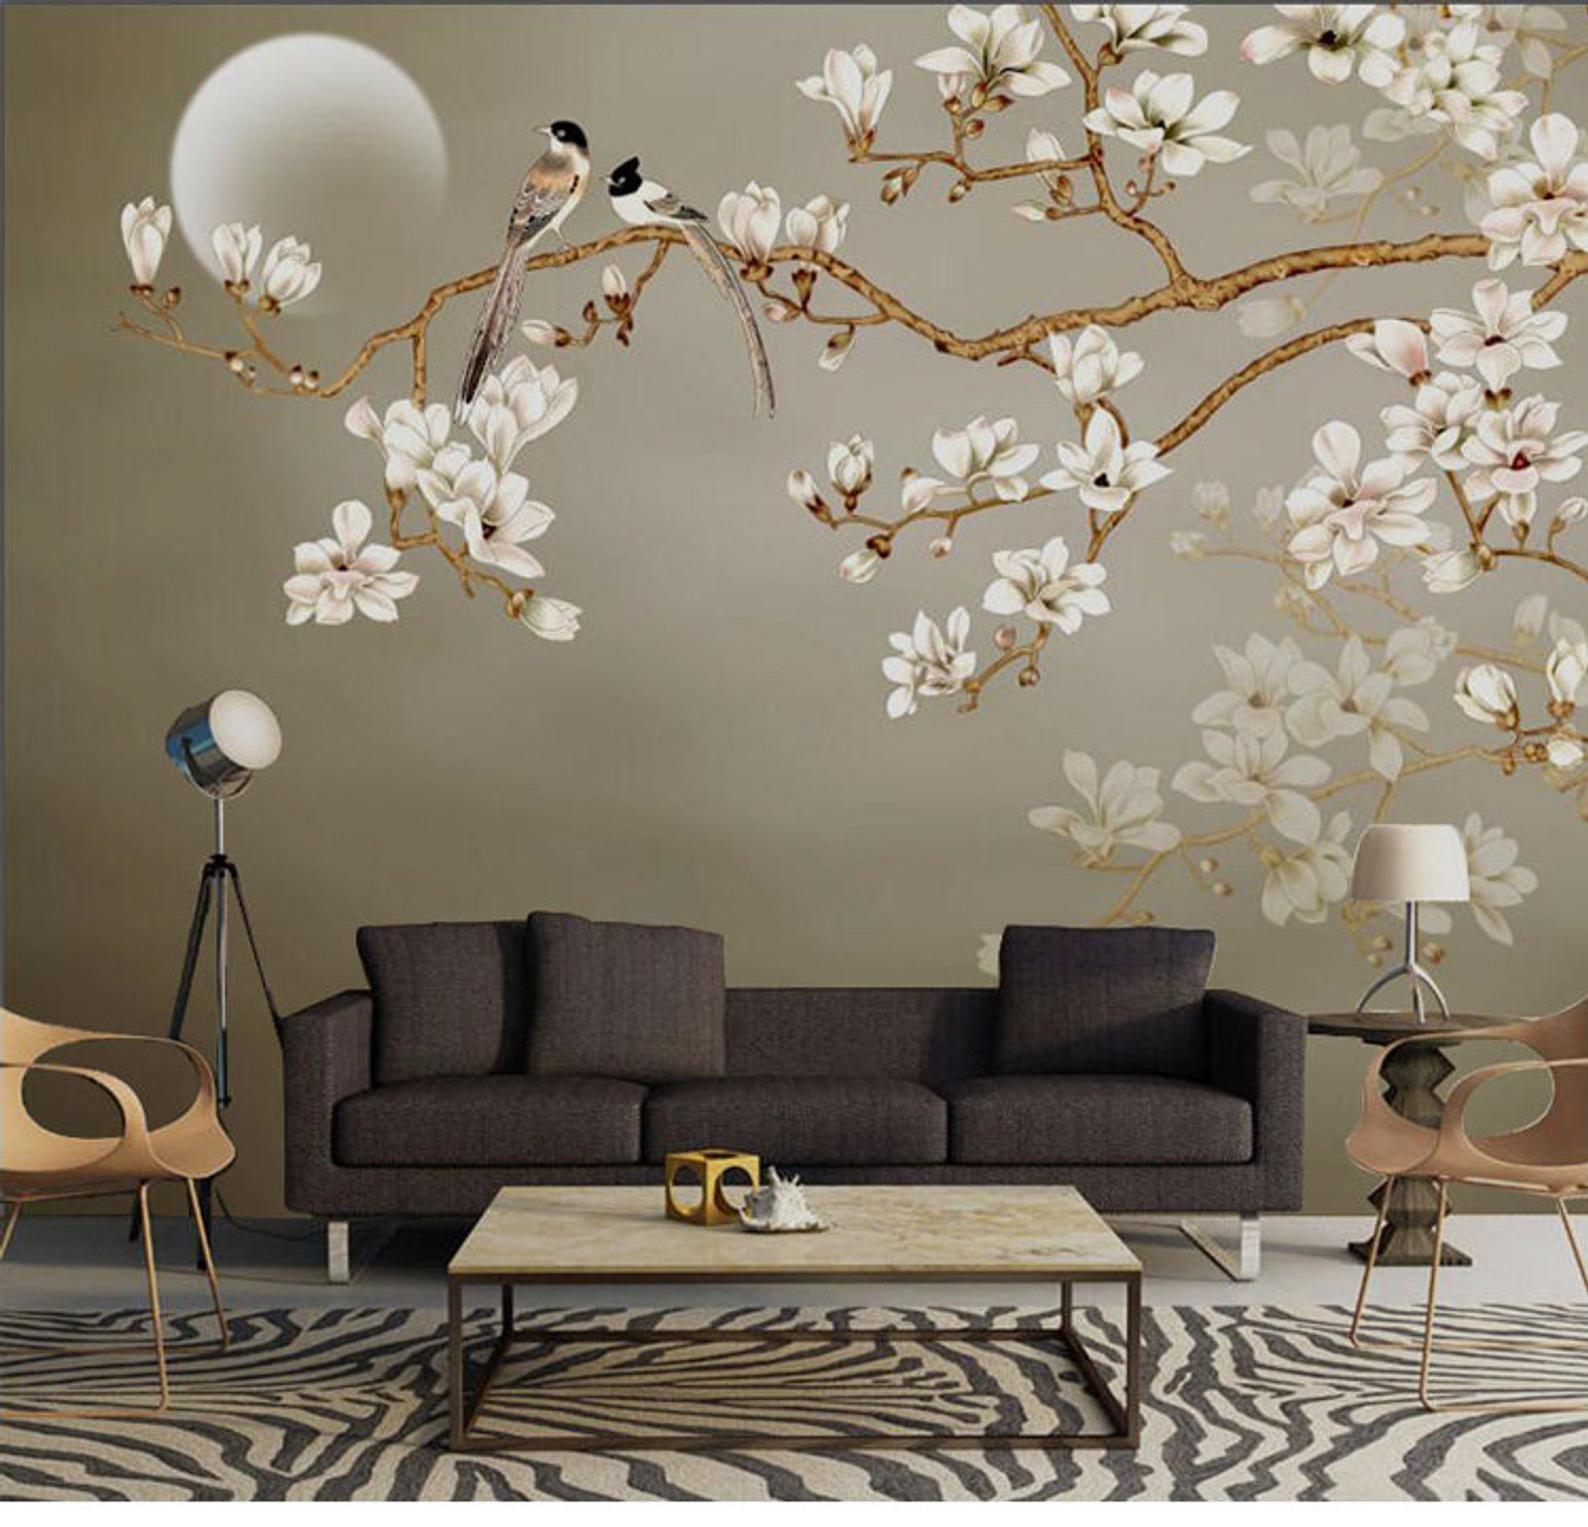 One Large Branch Tree White Flowers Wallpaper Wall Mural Etsy In 2020 Wall Wallpaper Wall Murals Floral Wallpaper